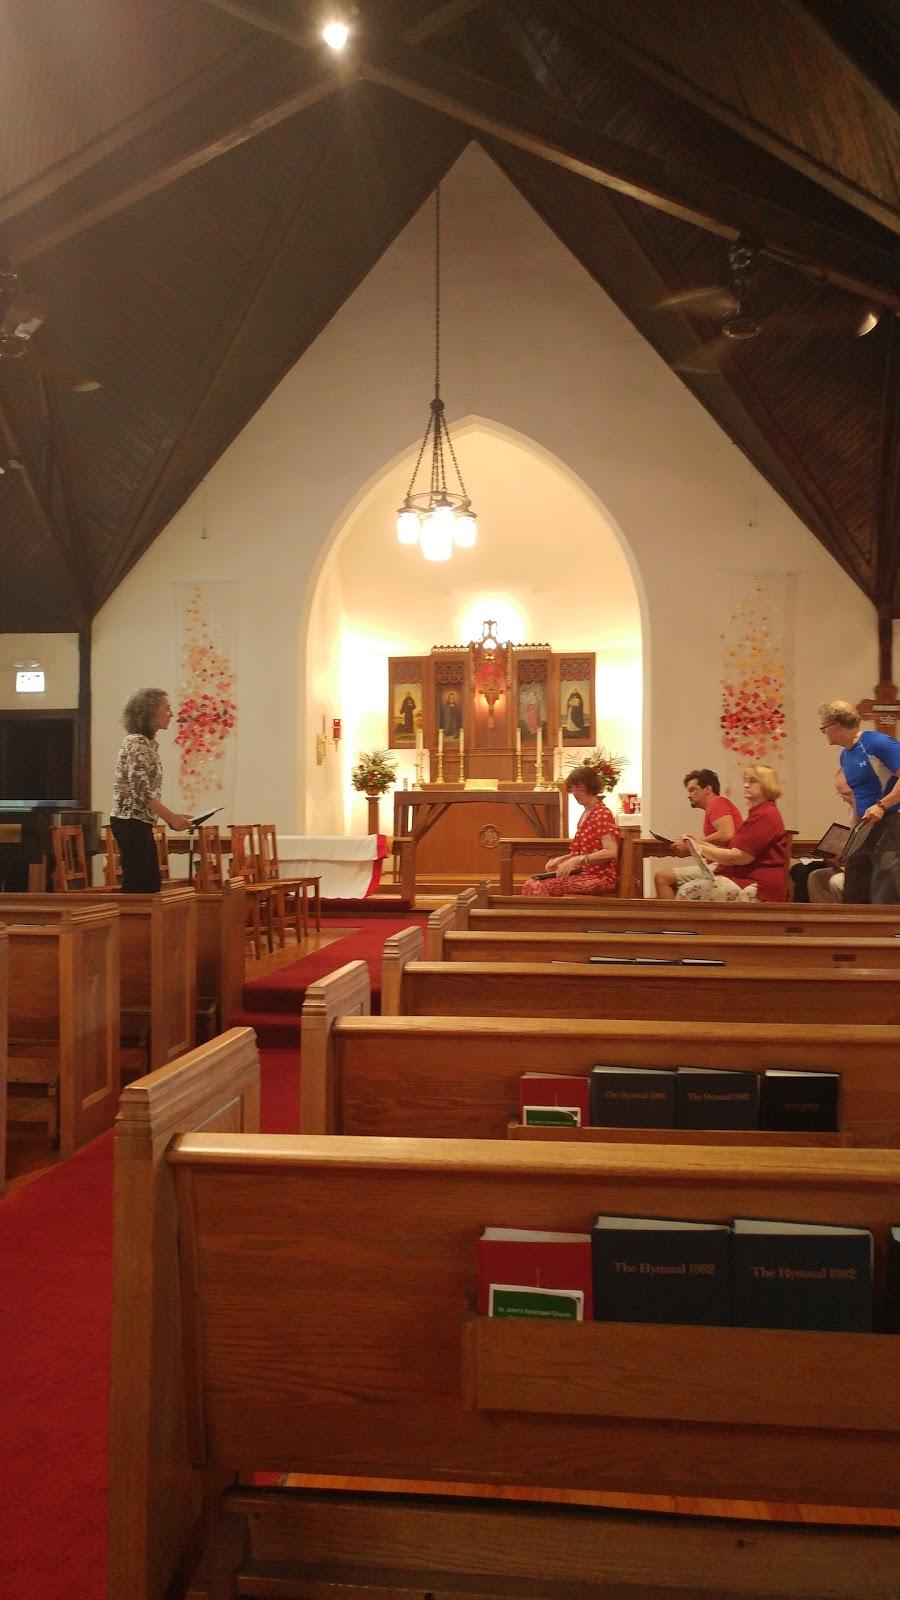 St Johns Episcopal Church - church    Photo 8 of 10   Address: 3857 N Kostner Ave, Chicago, IL 60641, USA   Phone: (773) 725-9026